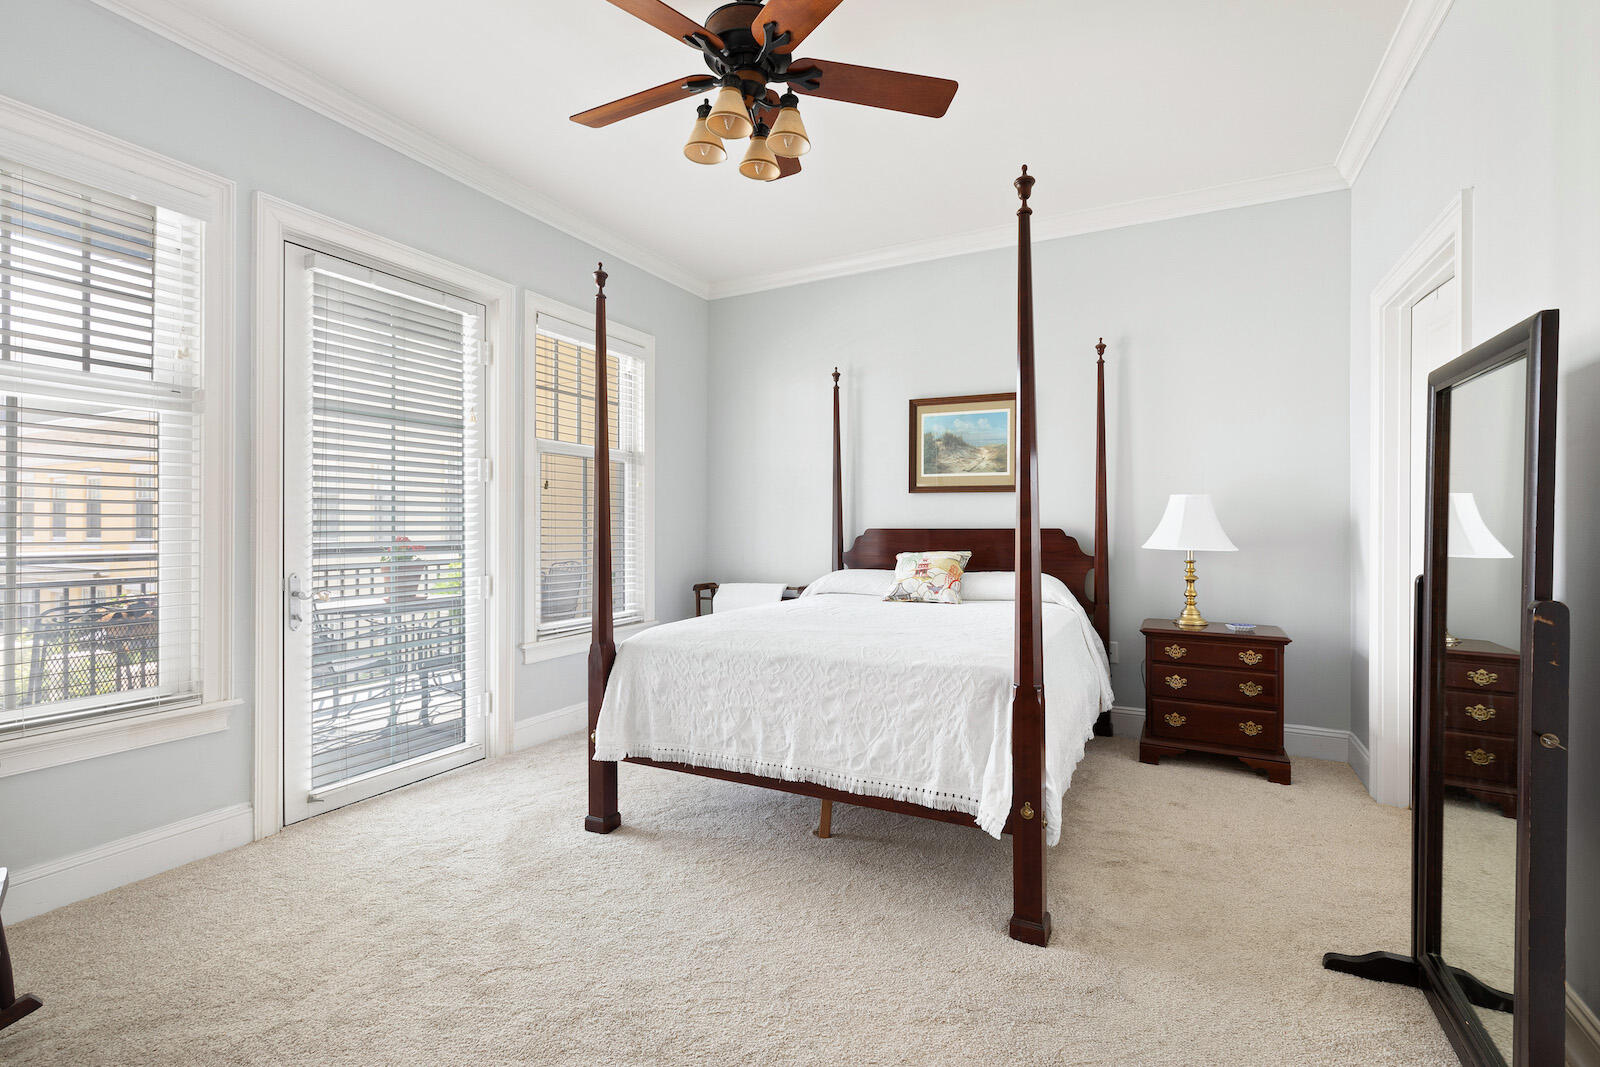 Albemarle Condos For Sale - 498 Albemarle, Charleston, SC - 1